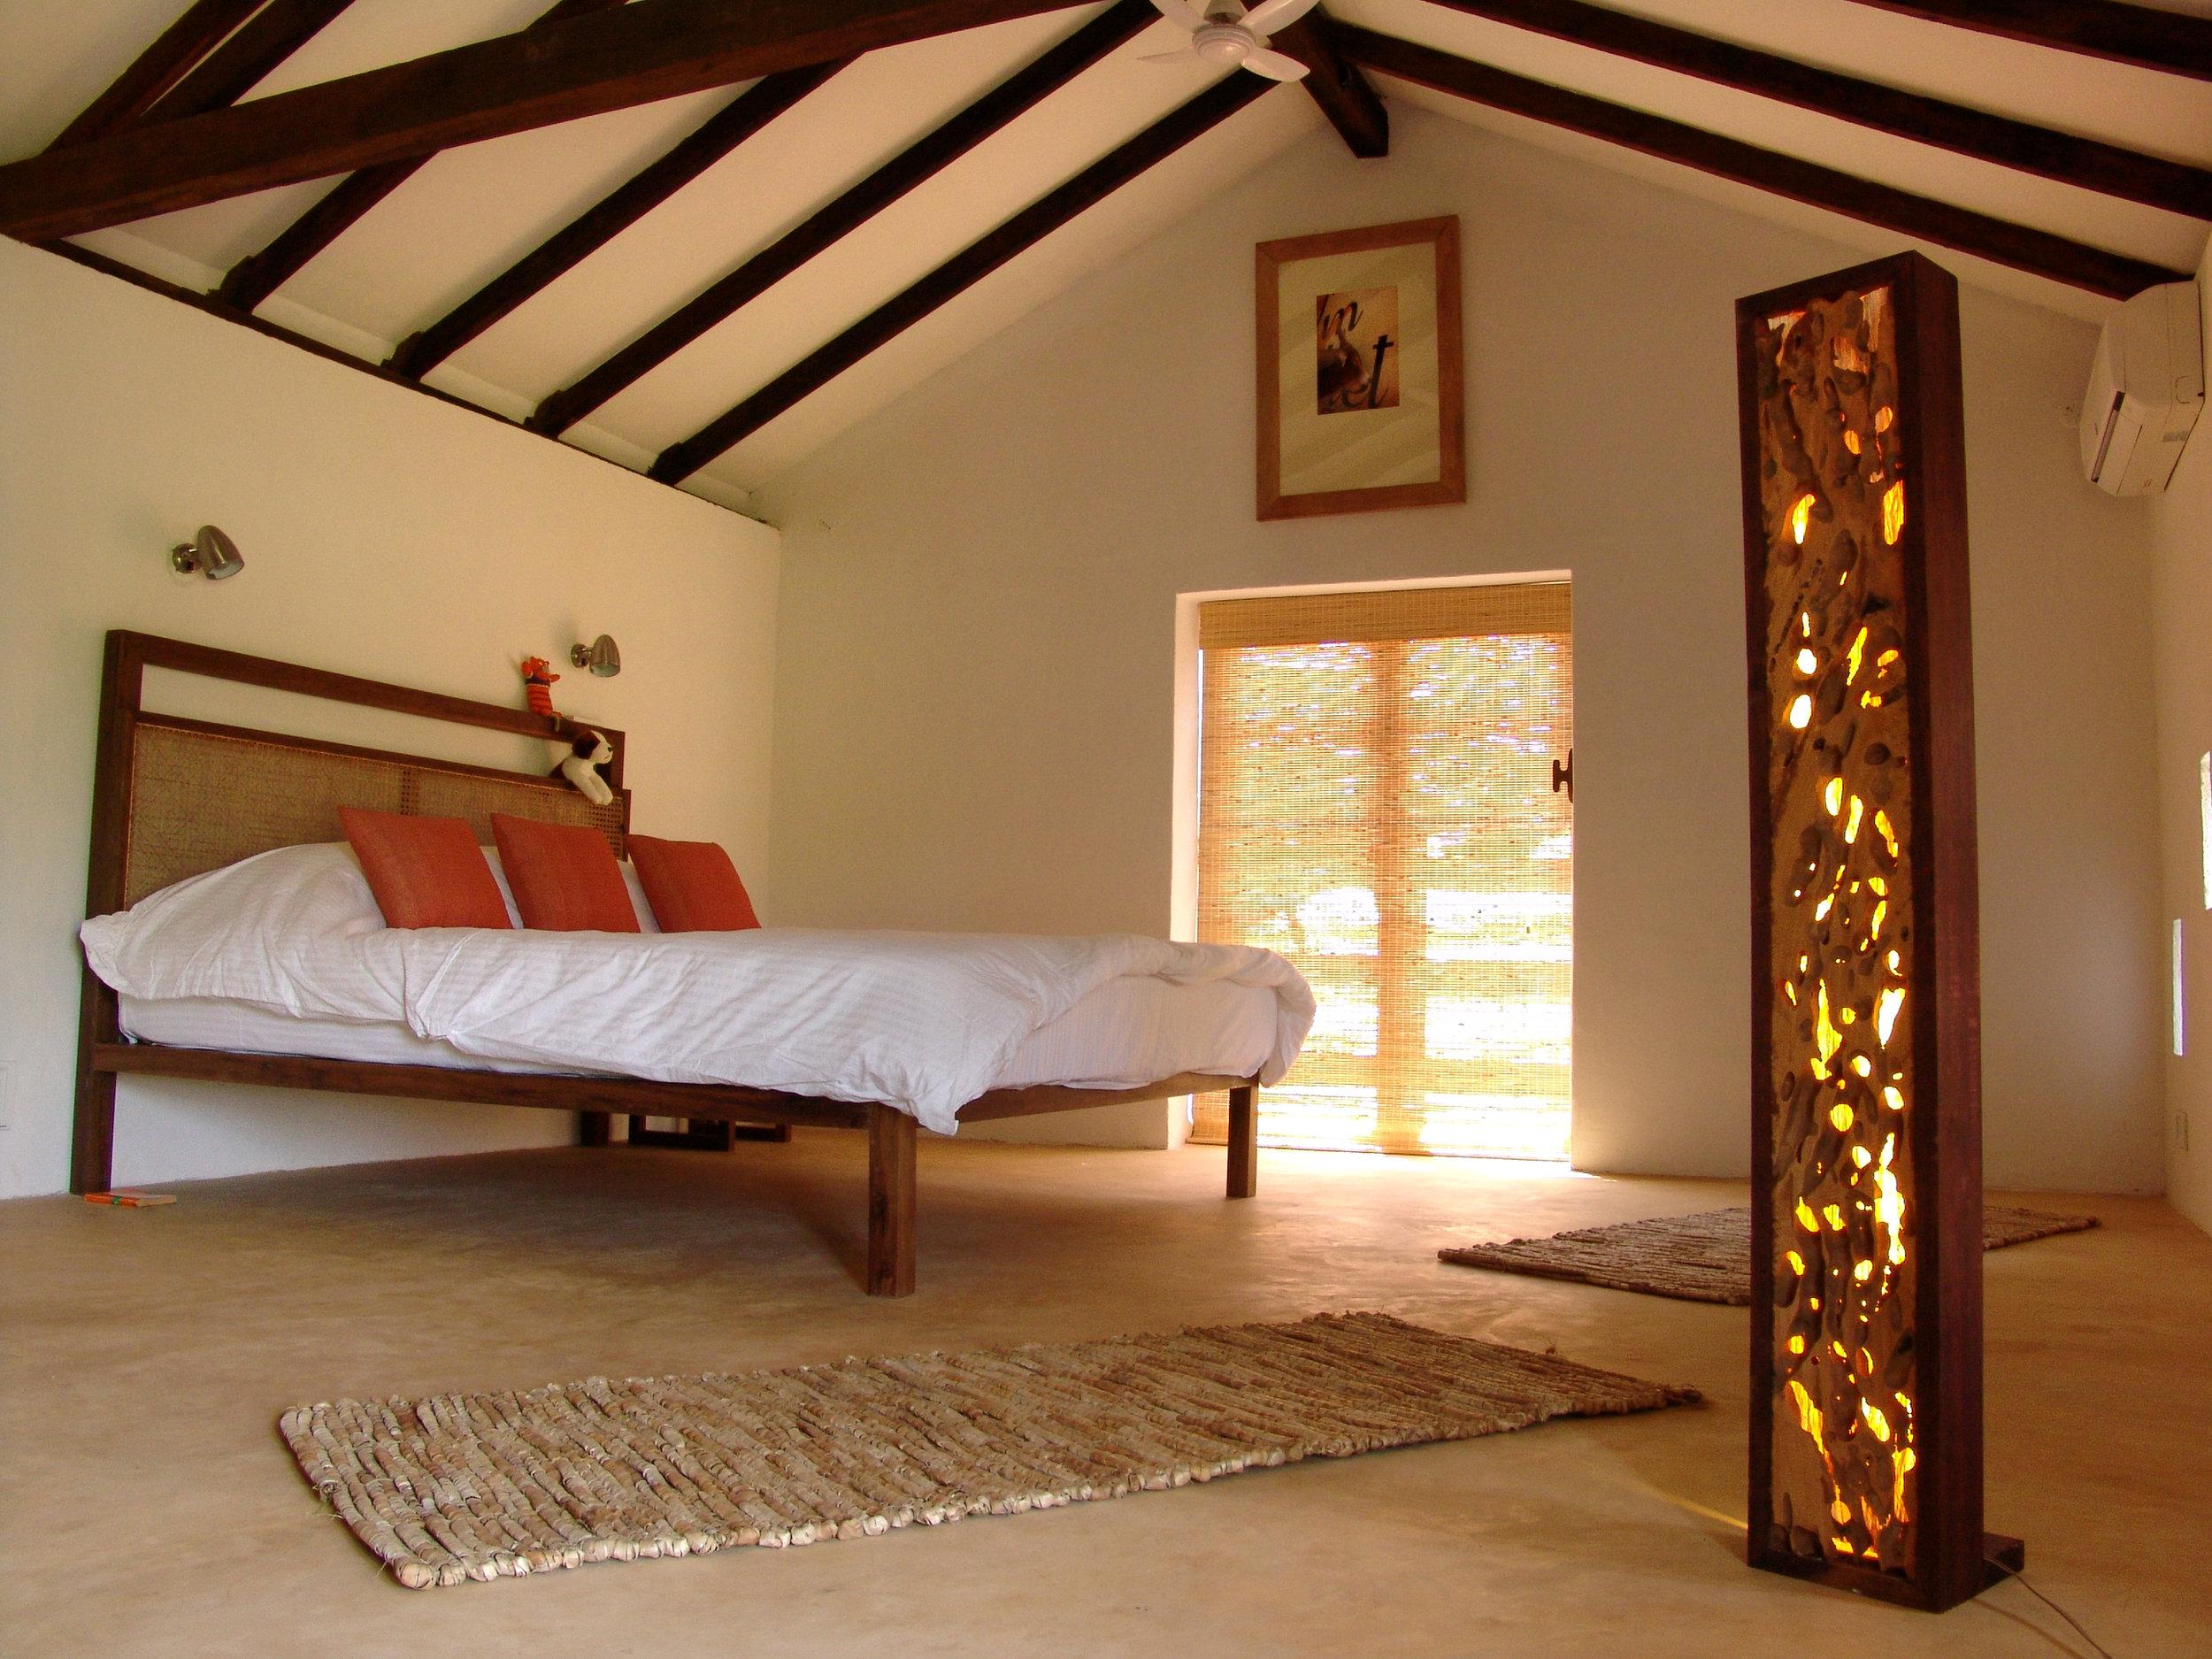 Poilo Gor Bedroom.jpg